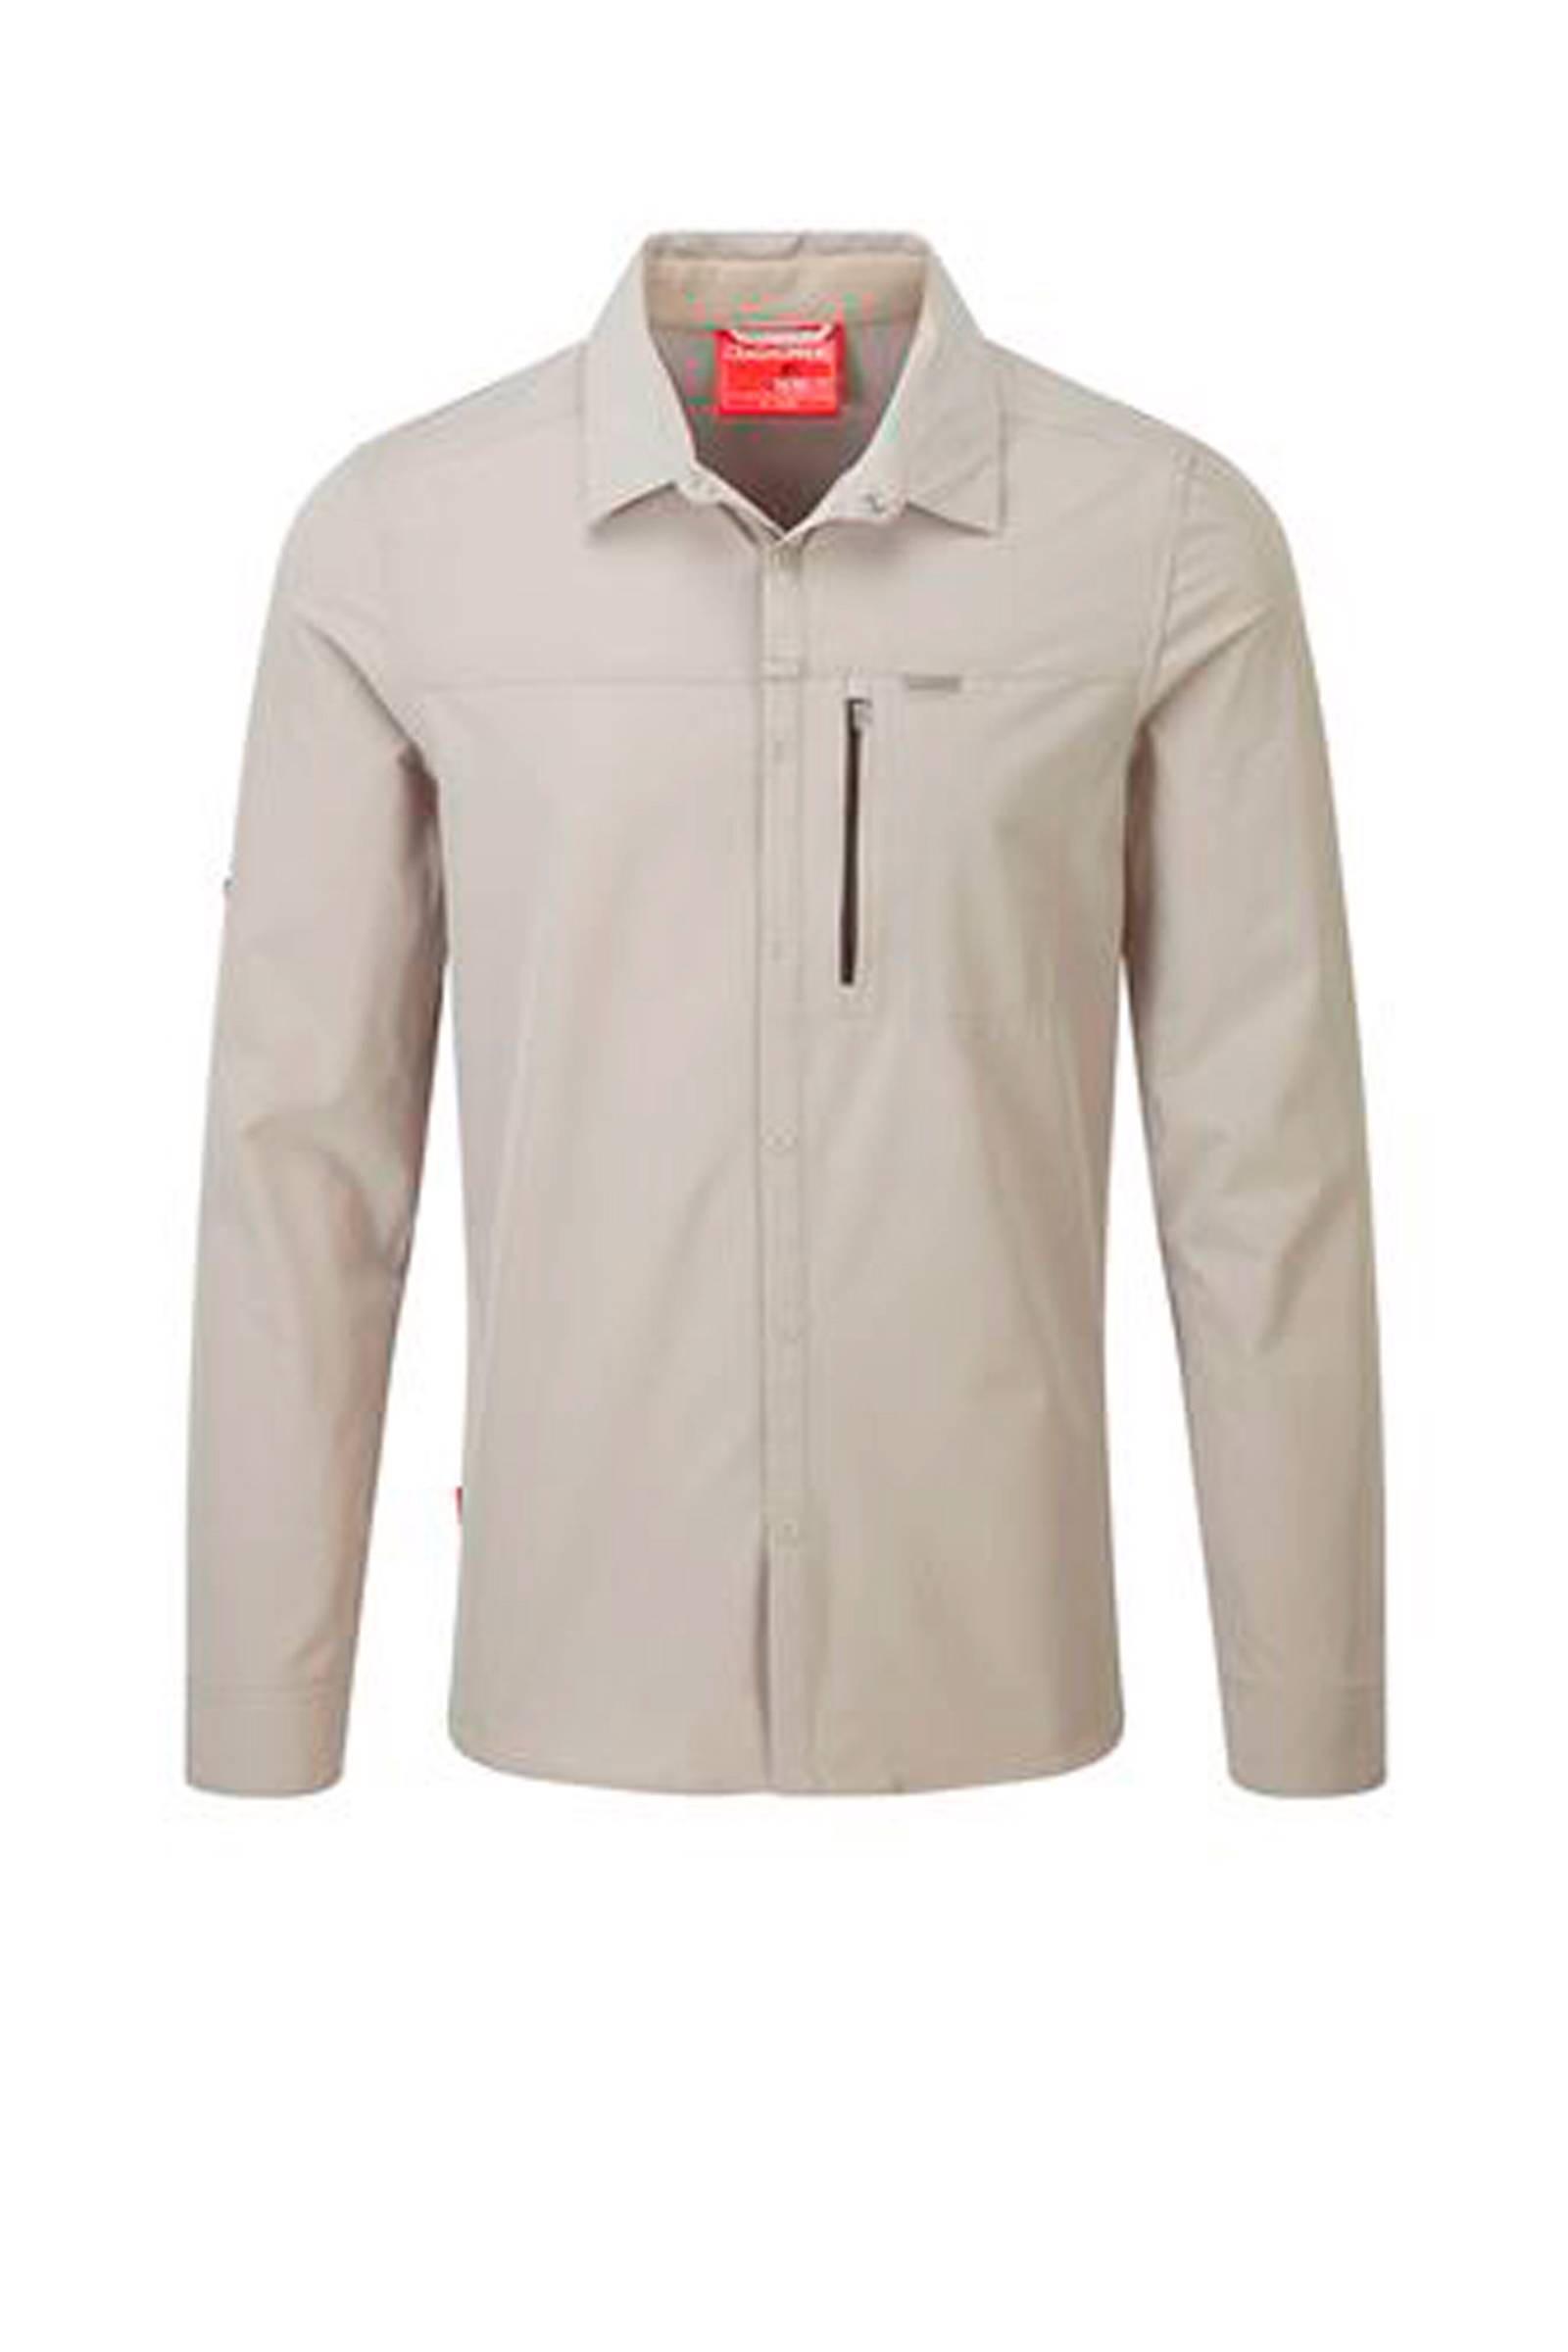 Craghoppers outdoor Nosilife lichtgewicht Pro overhemd r1R41Yxwq